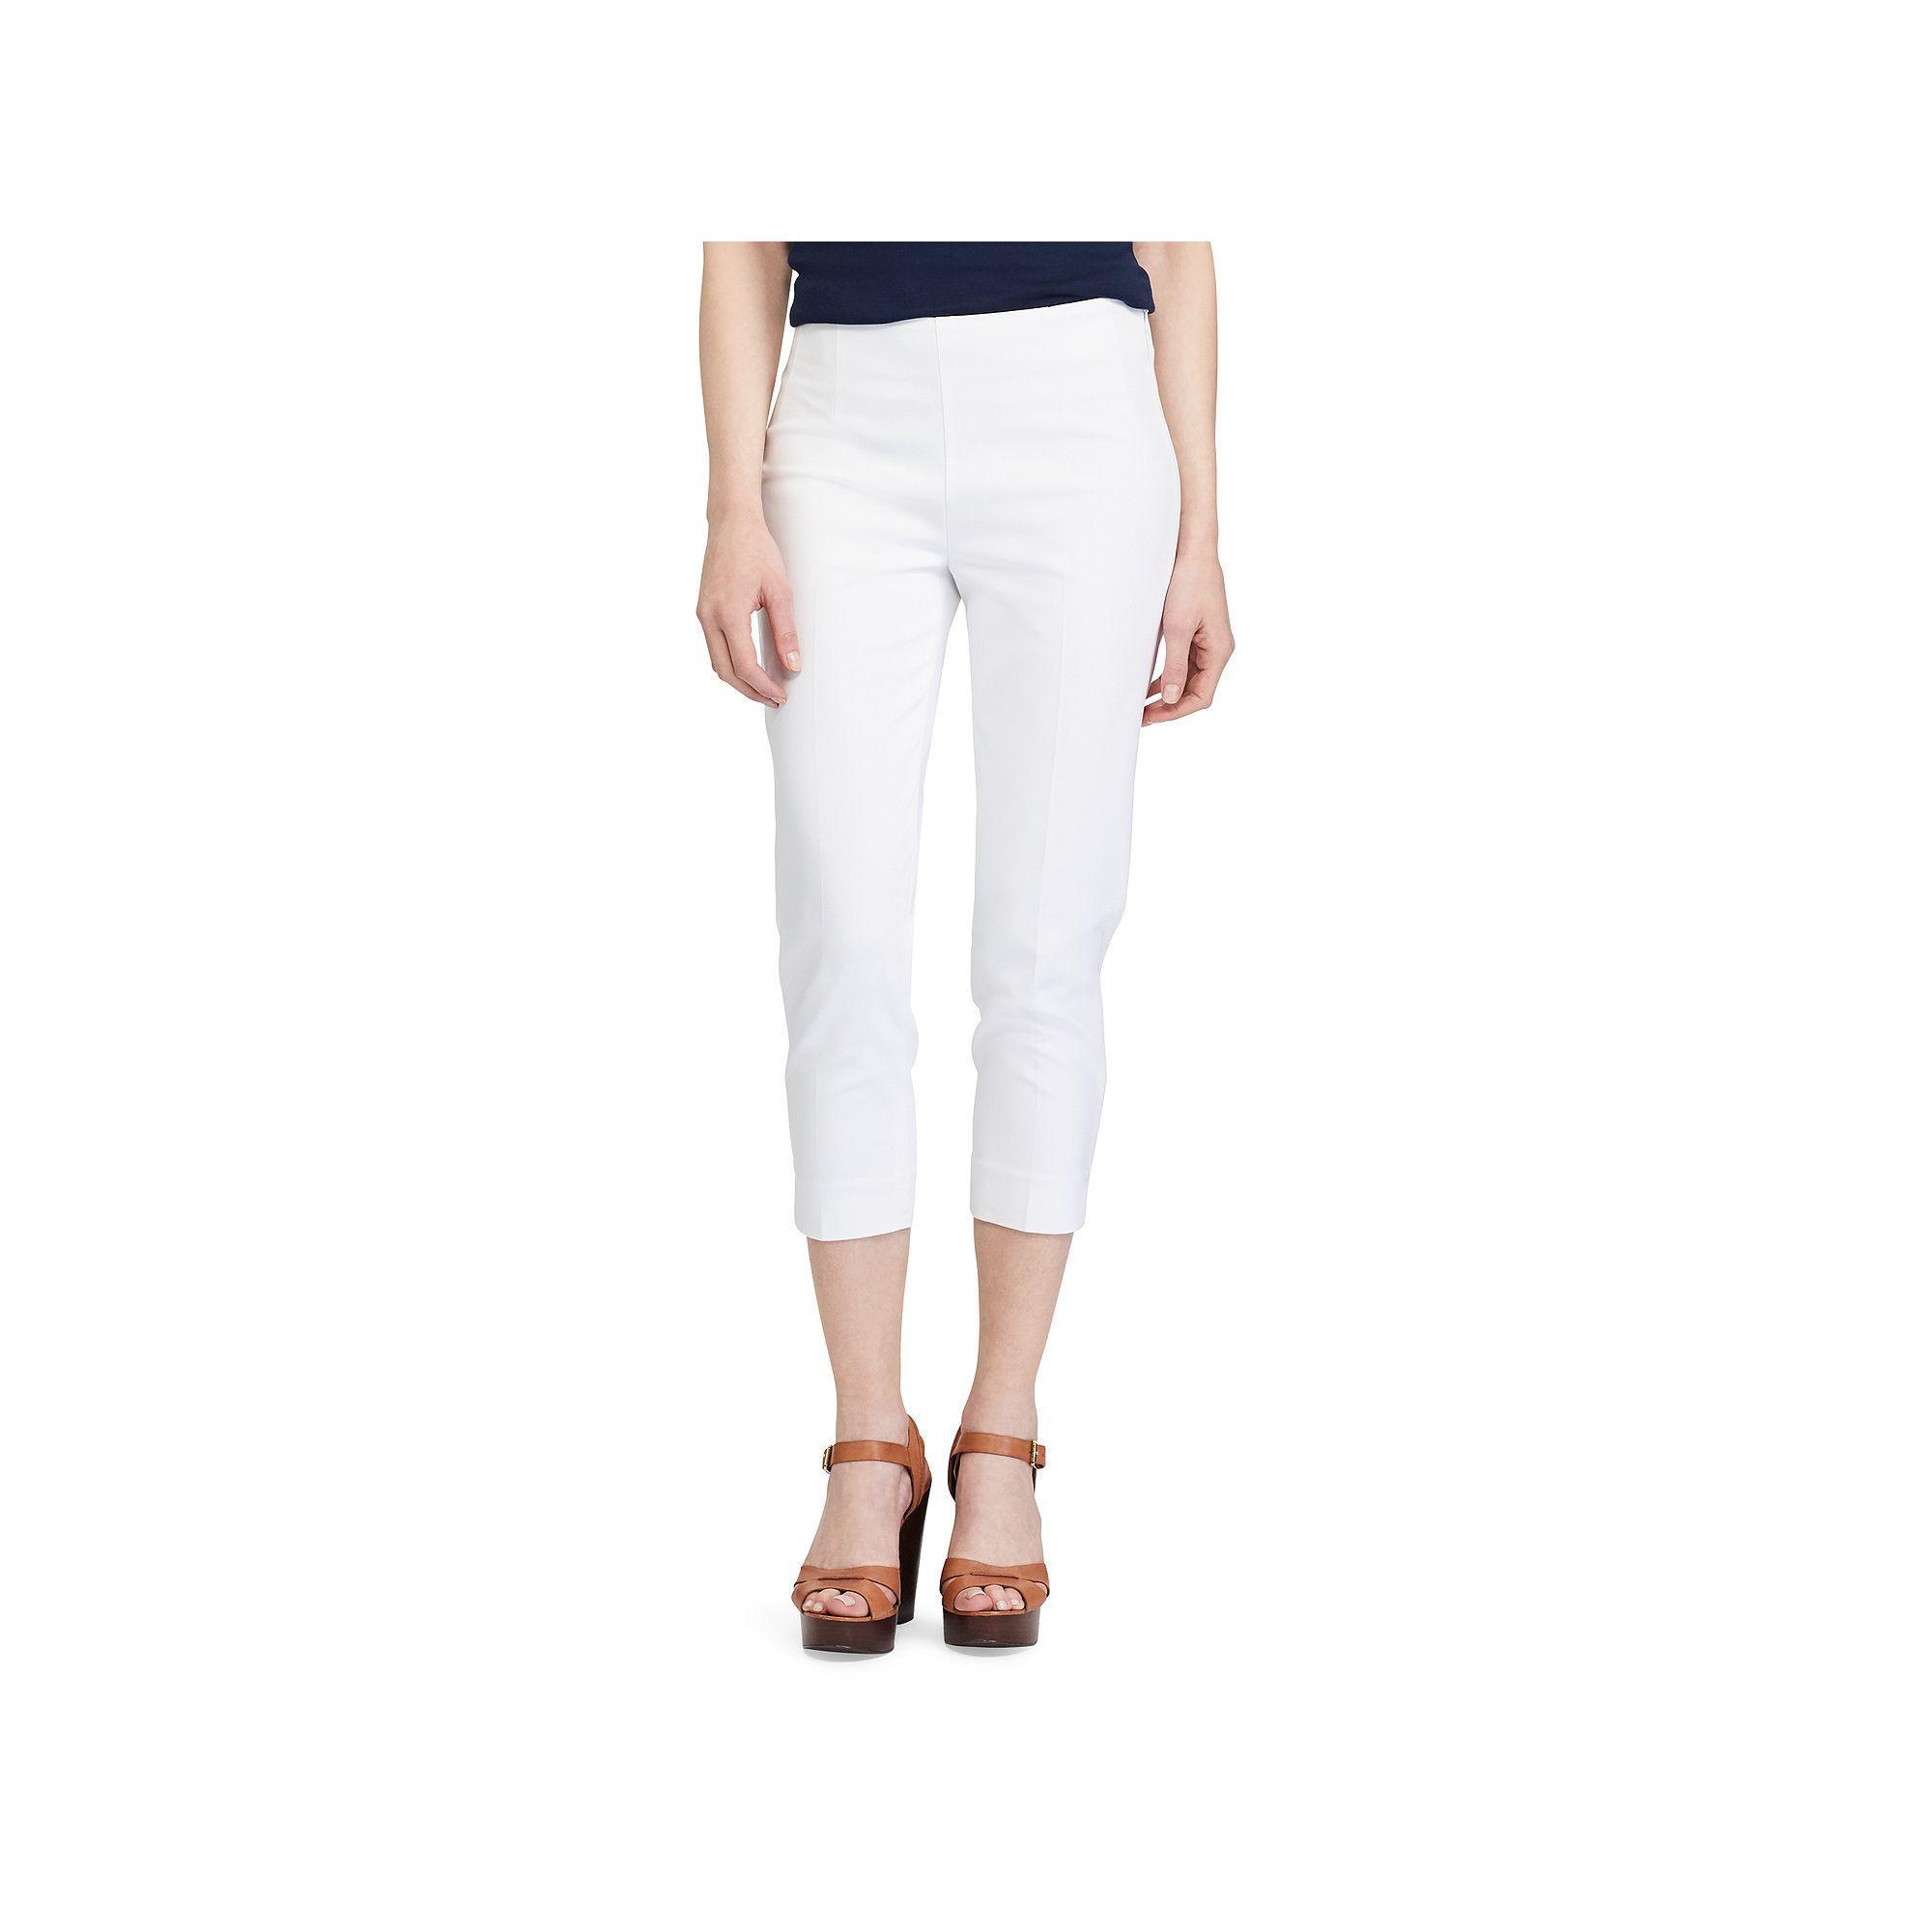 Petite Chaps Stretch Capris, Women's, Size: 16 Petite, White | Size 16